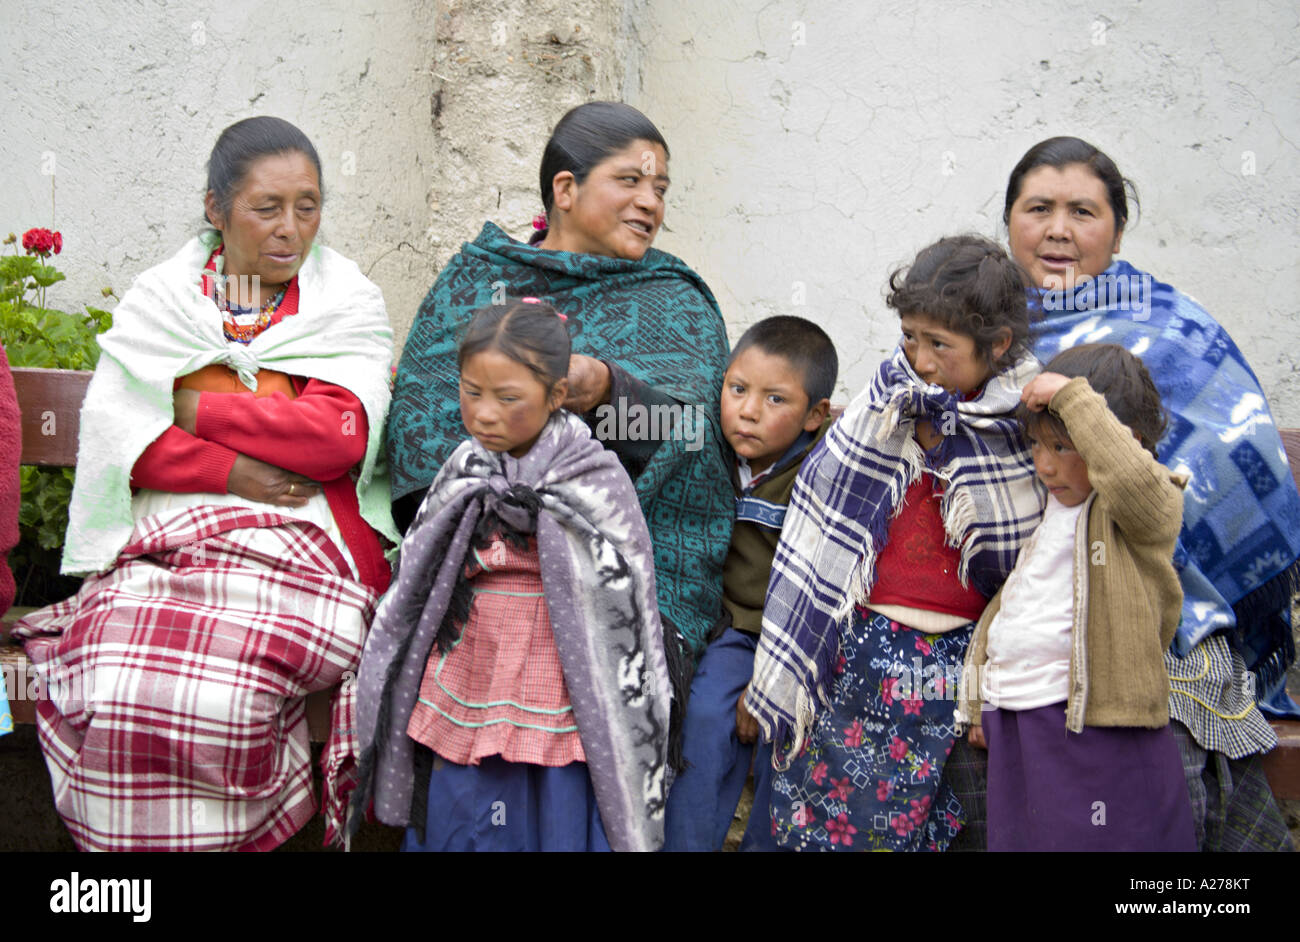 eed578c8d3fd3 ... hombres en sombreros de vaqueros a la espera de ser atendidos en la clínica  médica. A278WM (RM). GUATEMALA CAPELLANIA indígenas maya Quiche